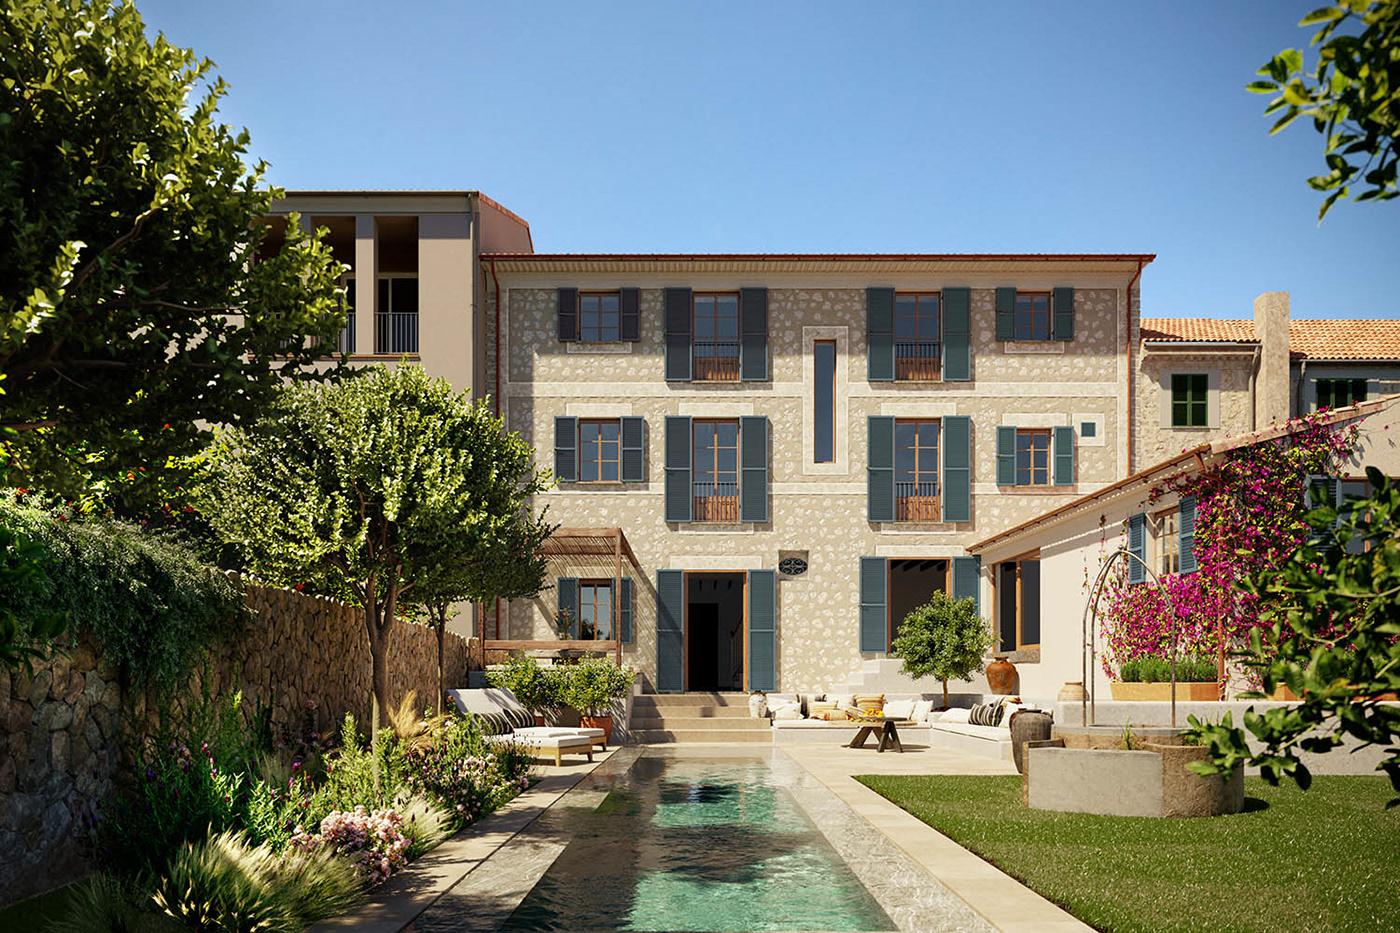 architecture CGI mallorca rendering Townhouse visualization